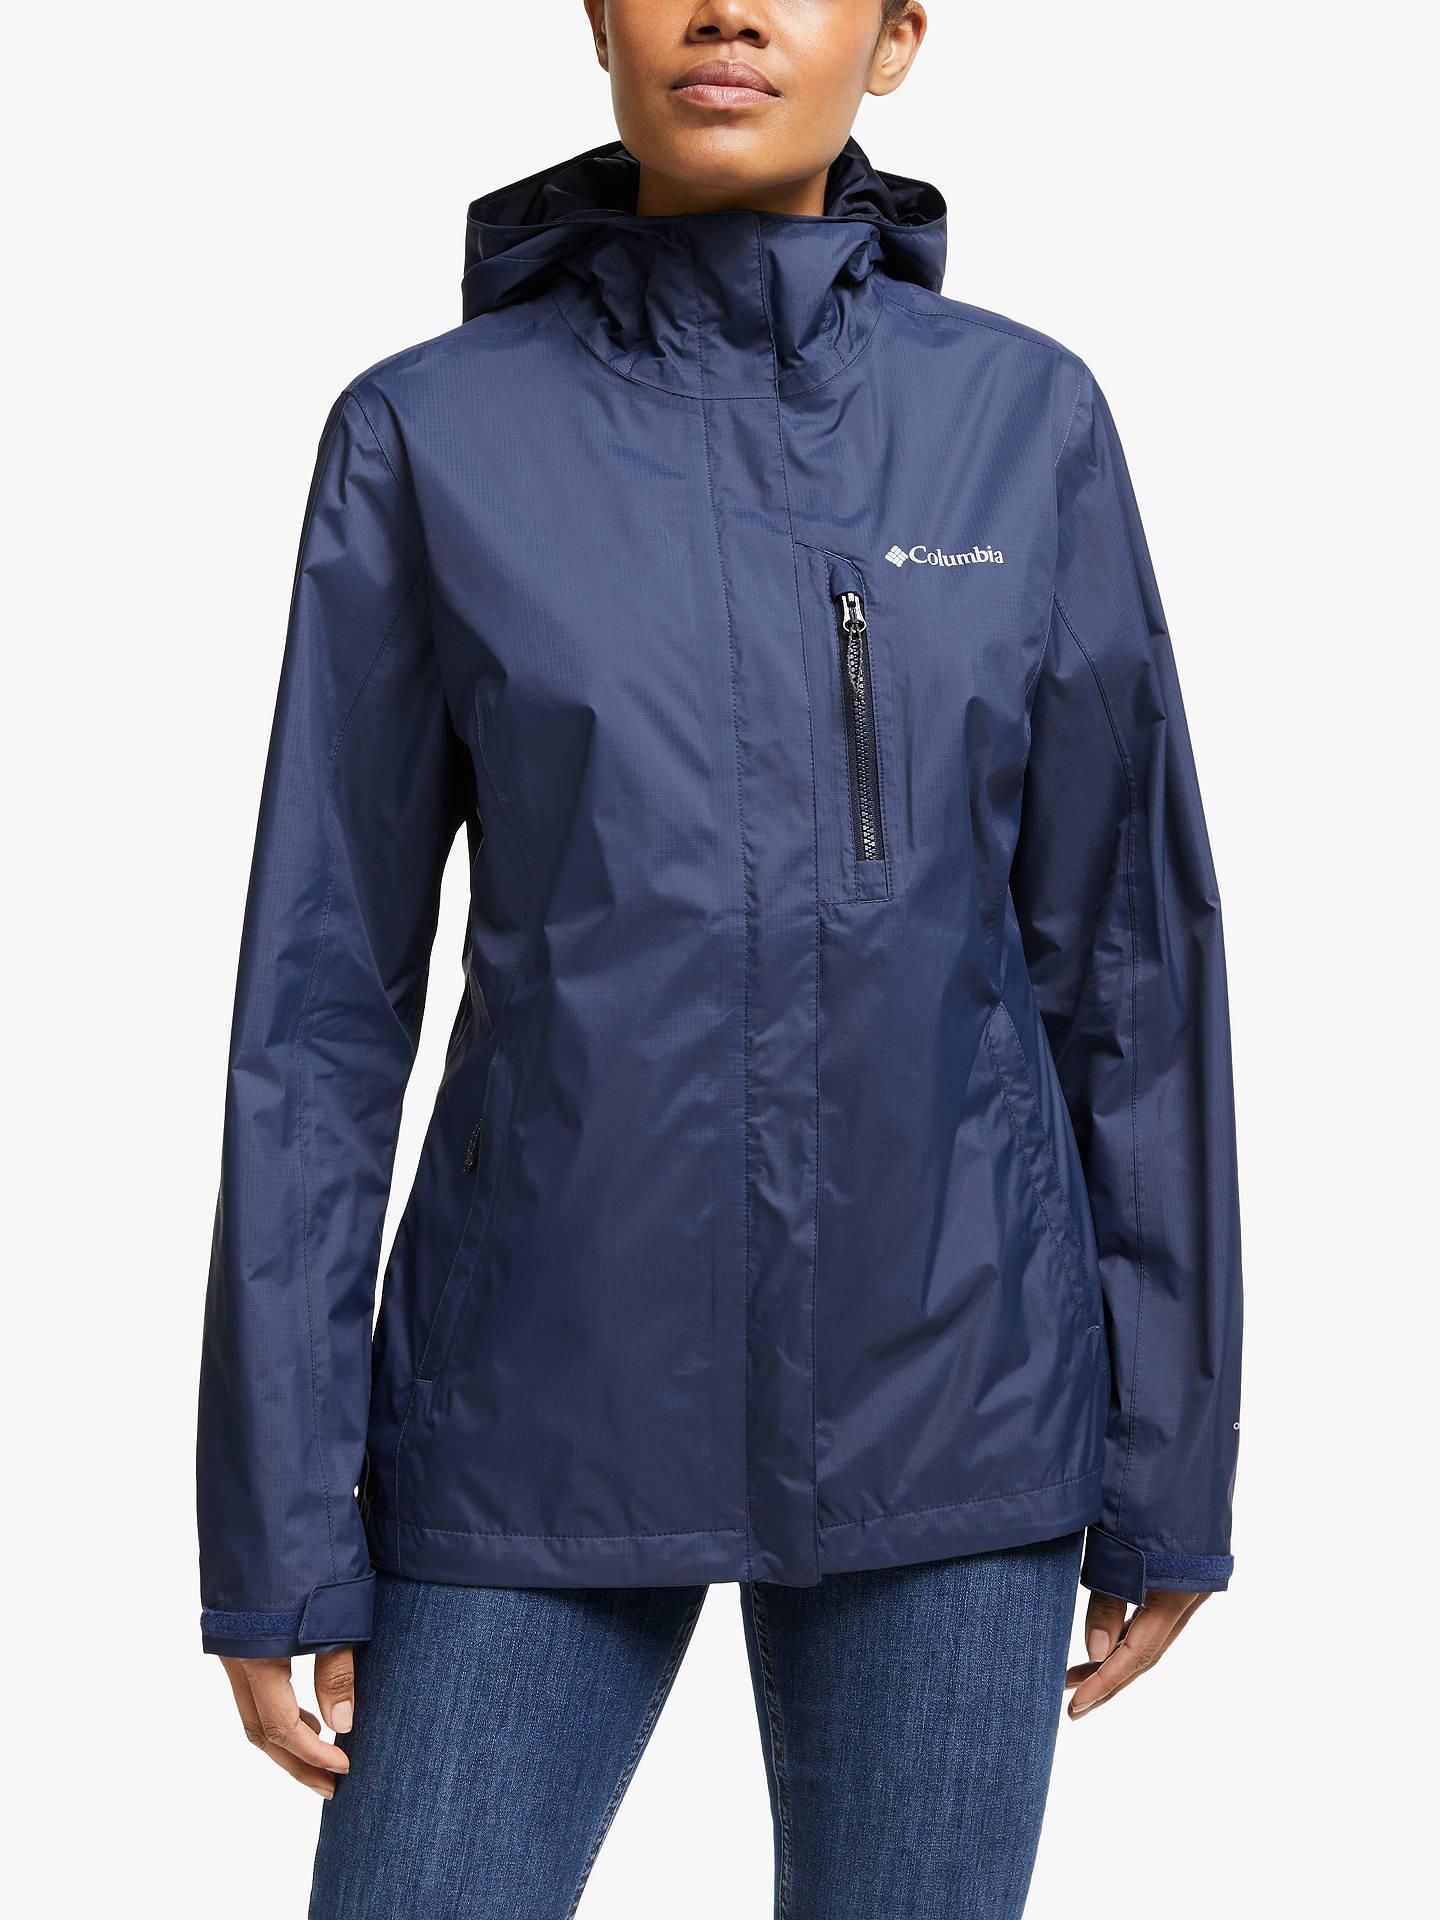 Columbia Pouring Adventure II Womens Waterproof Jacket